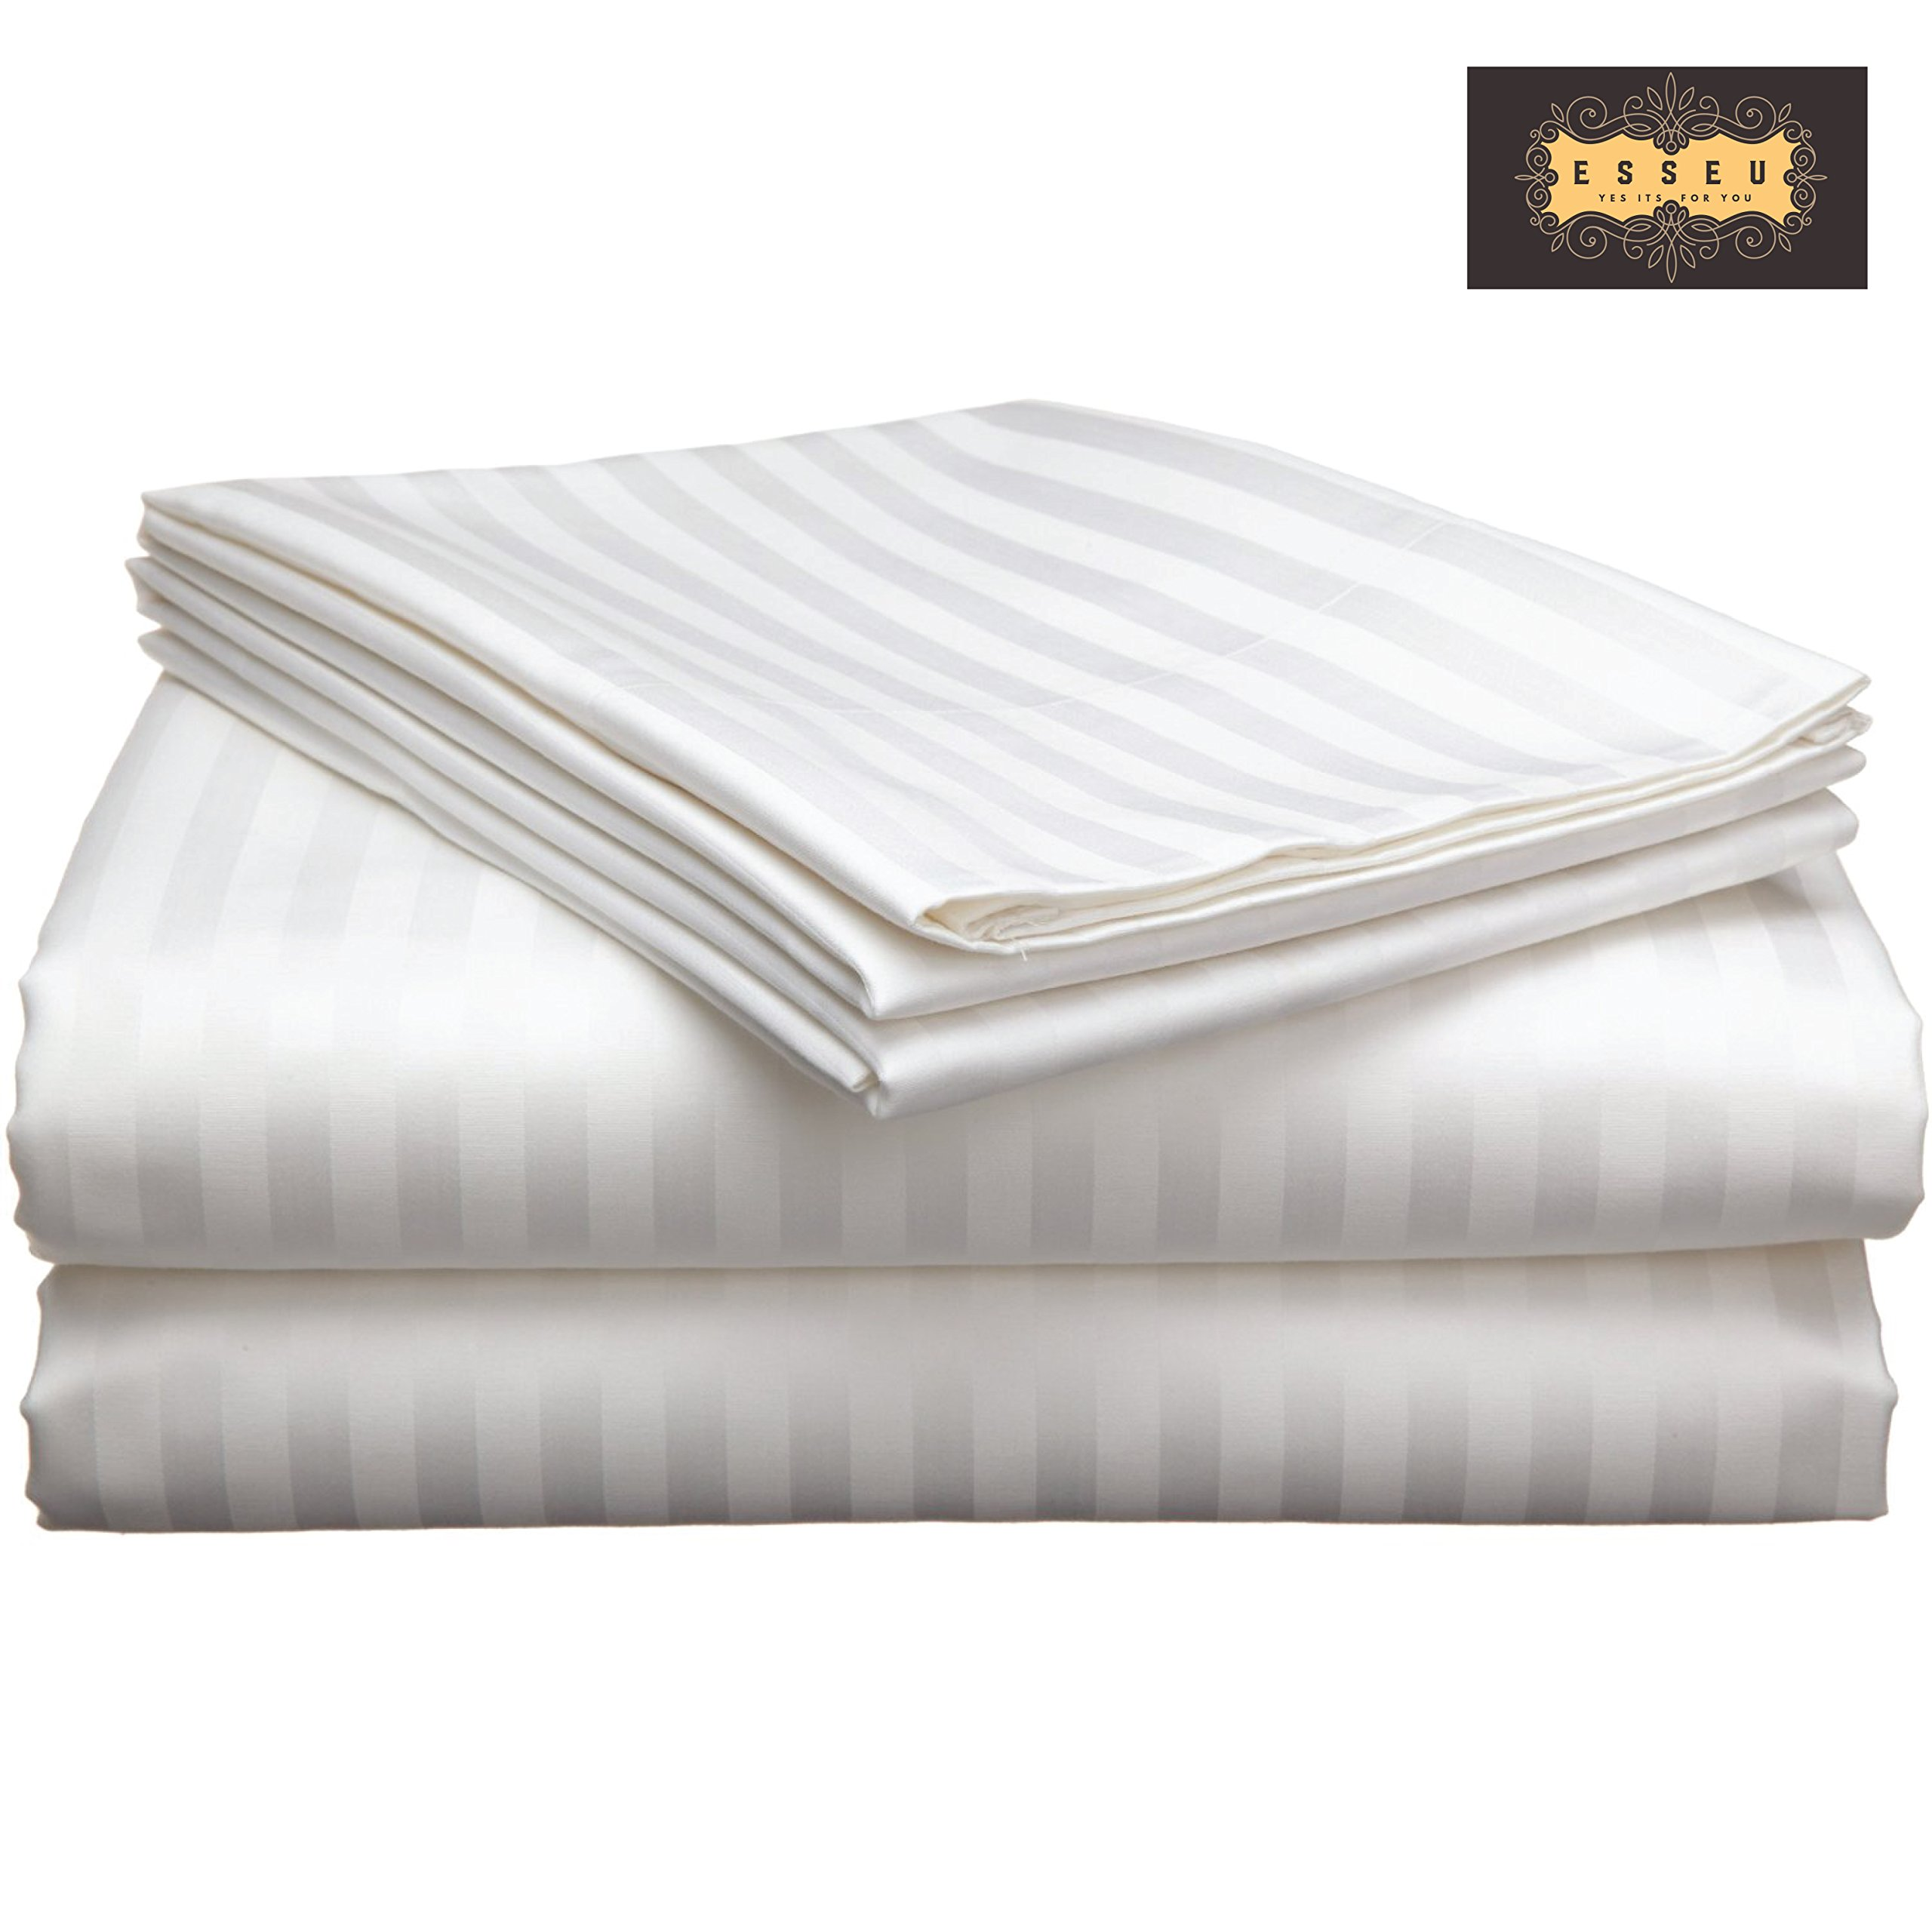 ESSEU 300 Thread Count 100% Cotton Sheet Set, Damask Stripe,Soft Sateen Weave, Deep Pockets,Home & Hotel Collection,Luxury Bedding Super Sale 100% Cotton (Queen, White)